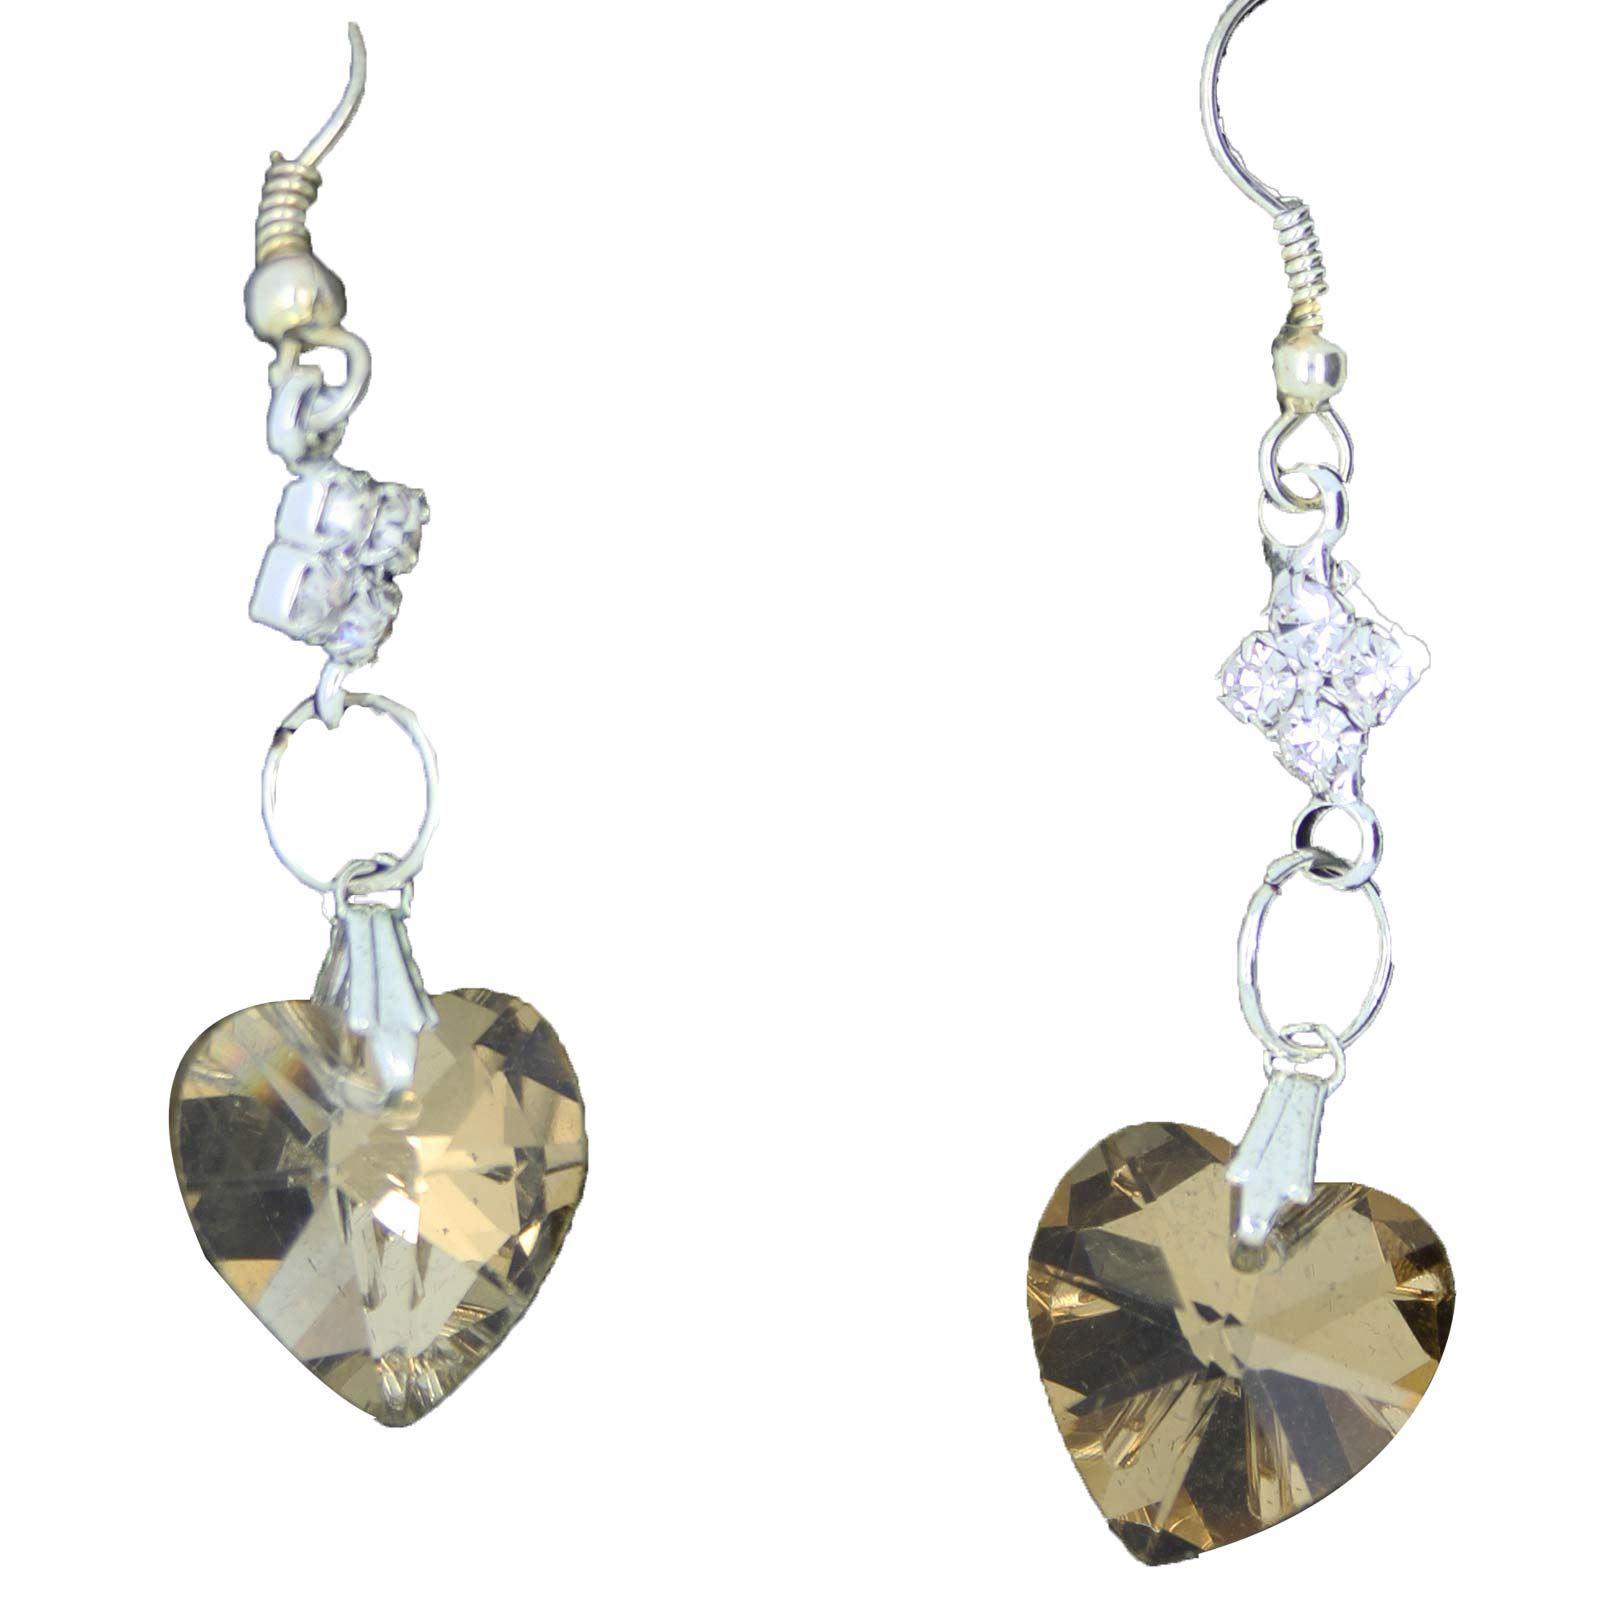 True-Face-Ladies-Women-039-s-Elegant-Earrings-Necklace-Set-Metal-Alloy-Jewellery thumbnail 38